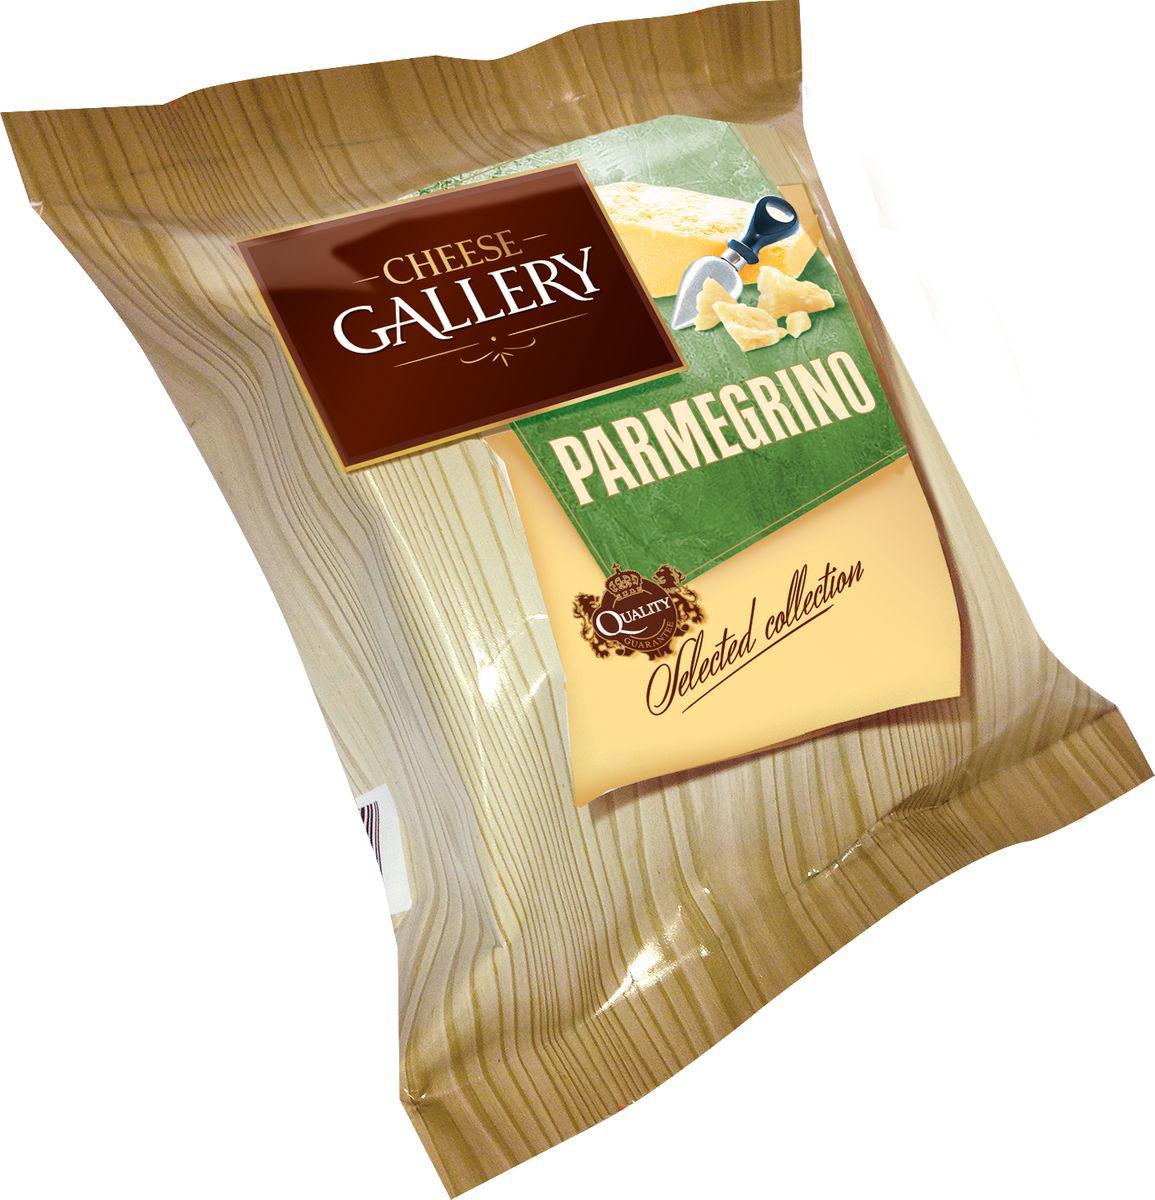 Cheese Gallery Сыр Гойя Parmegrino, 40%, 250 г сыр